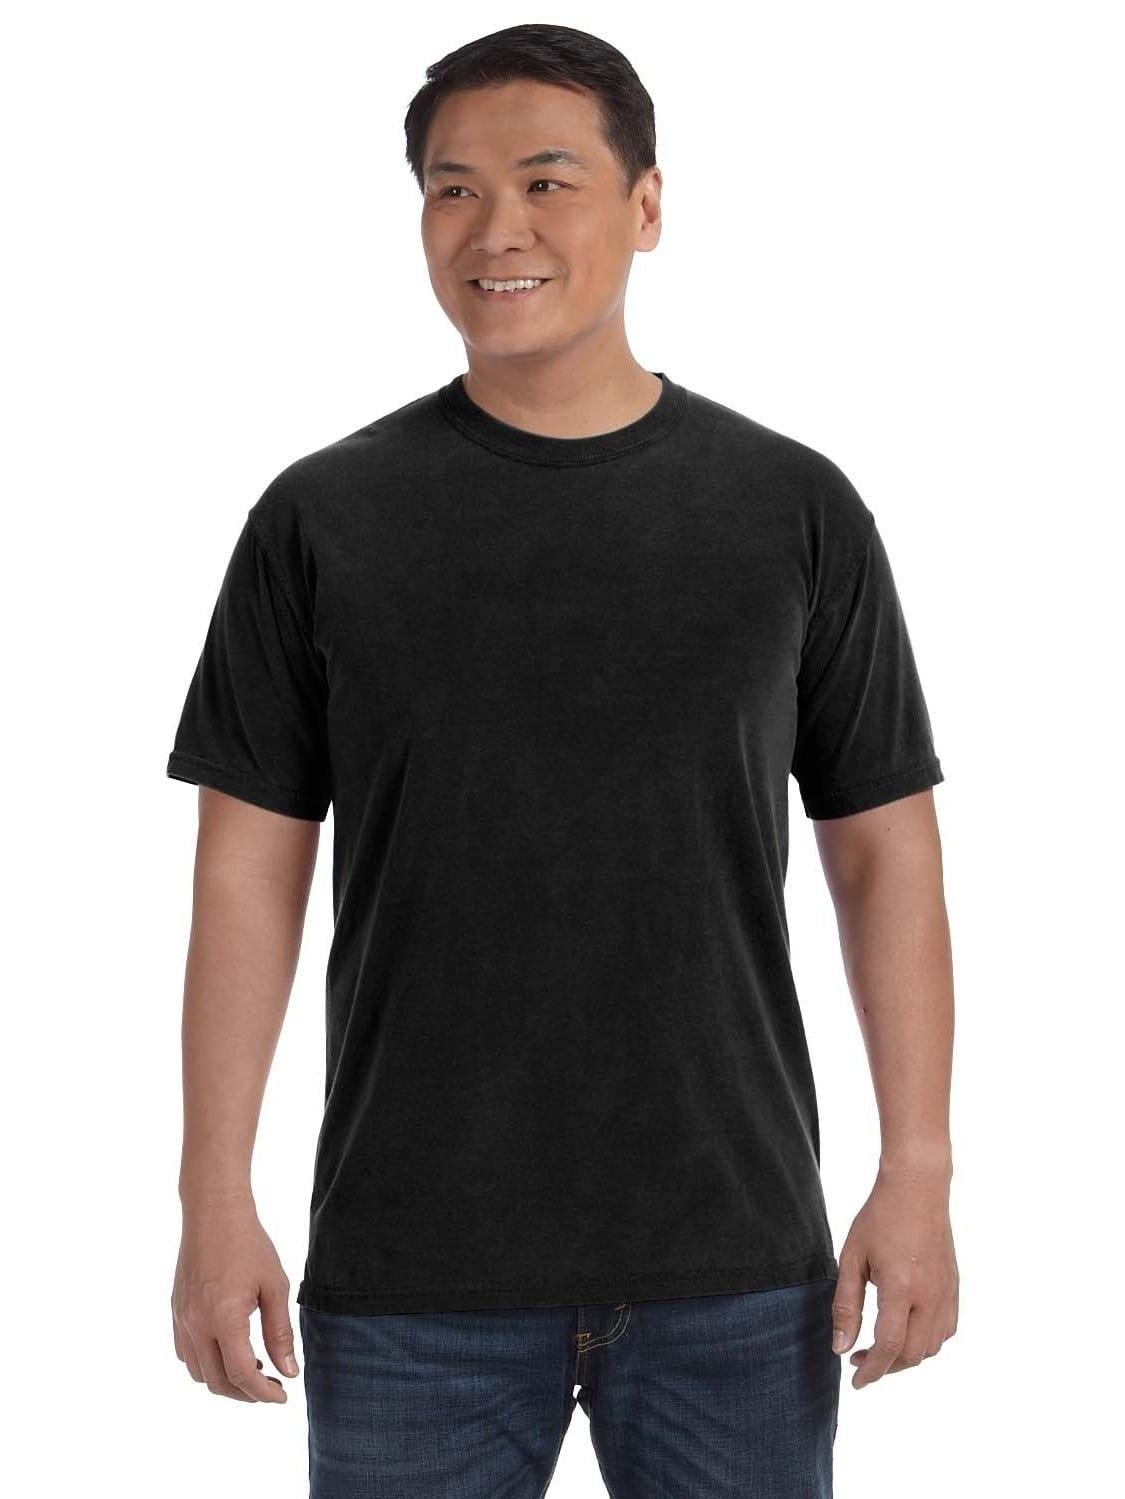 Comfort Colors  Men's Black Ringspun Cotton Garment-dyed Undershirt (Super Value Pack of 12)